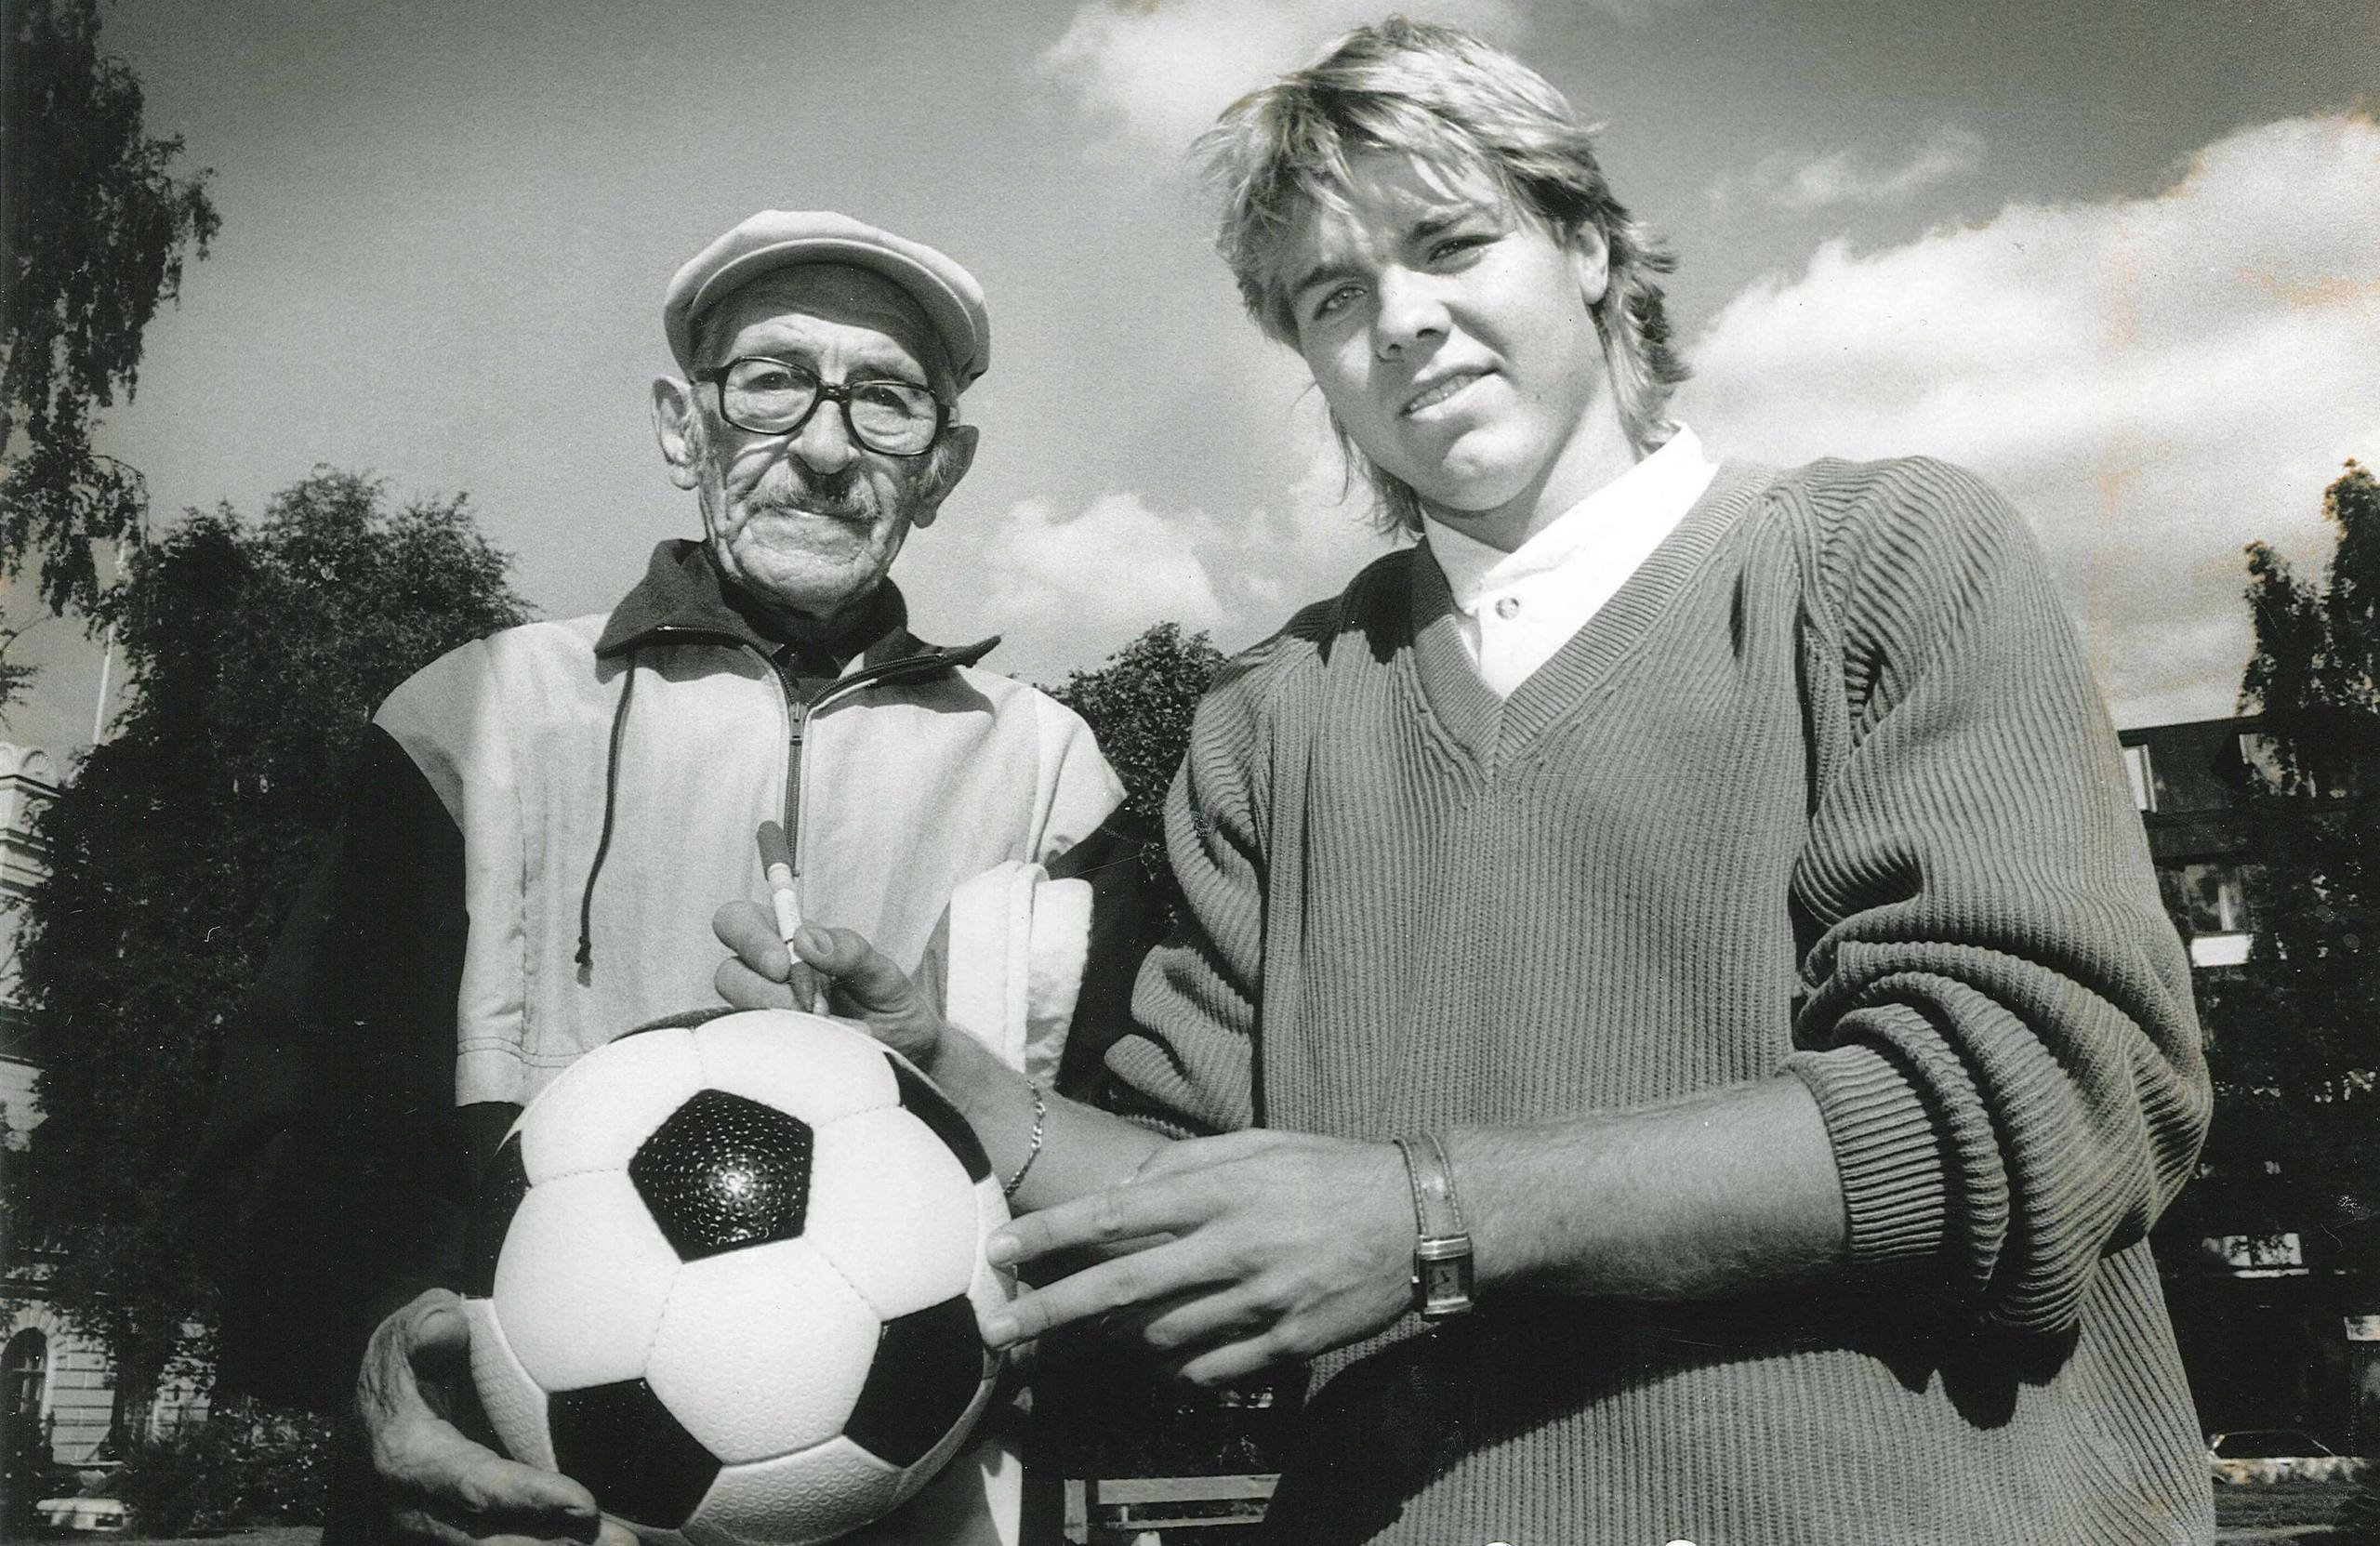 Svensk os malvakt avbrot matchen